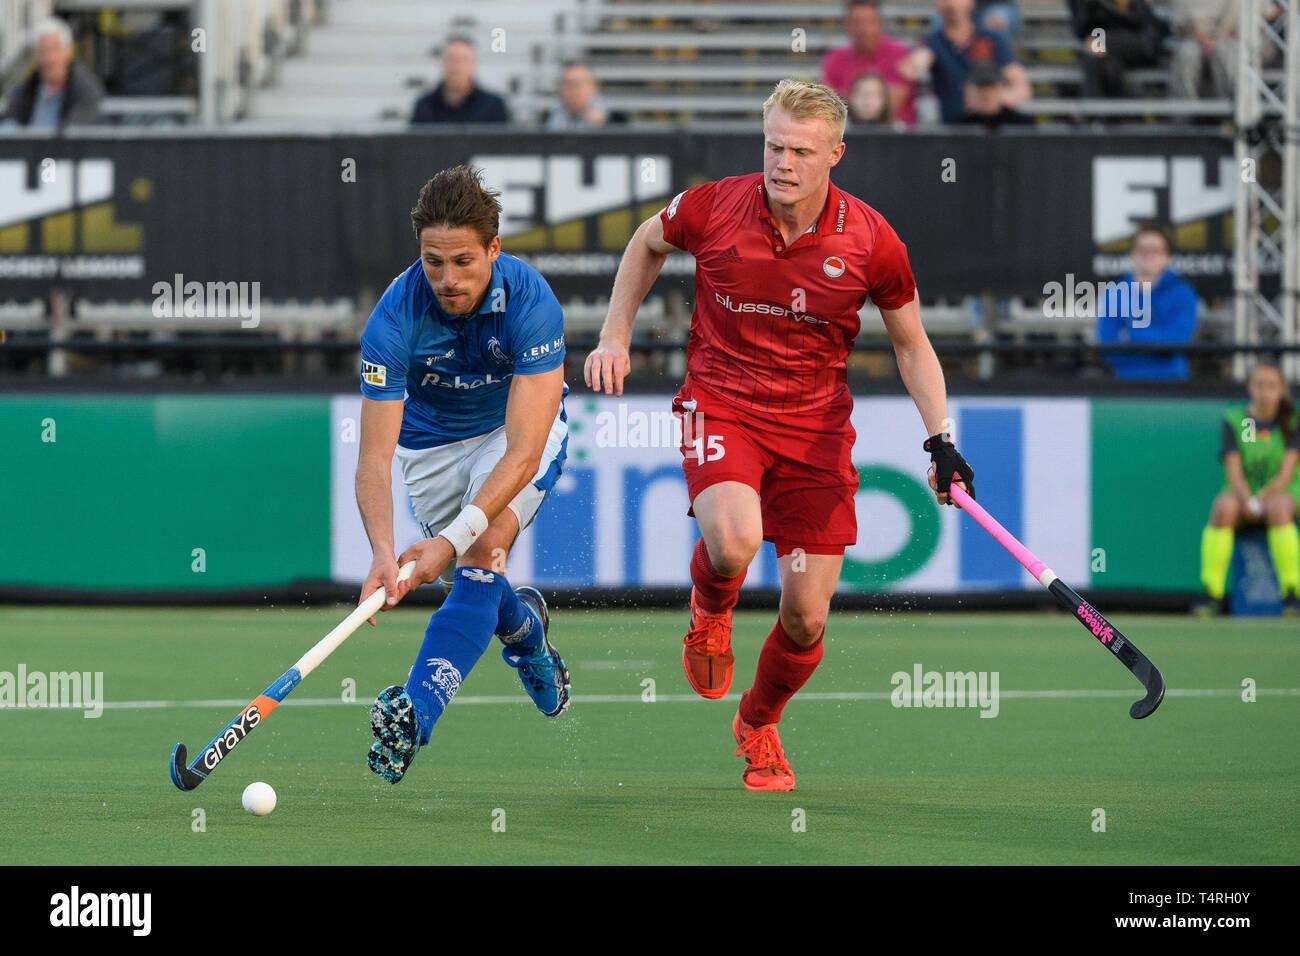 EINDHOVEN, 18-04-2019, Euro Hockey League 2019. Veranstaltungsort: HC Oranje-Rood. Während des Spiels SV Kampong vs Rot-Weiss Köln. Stockbild